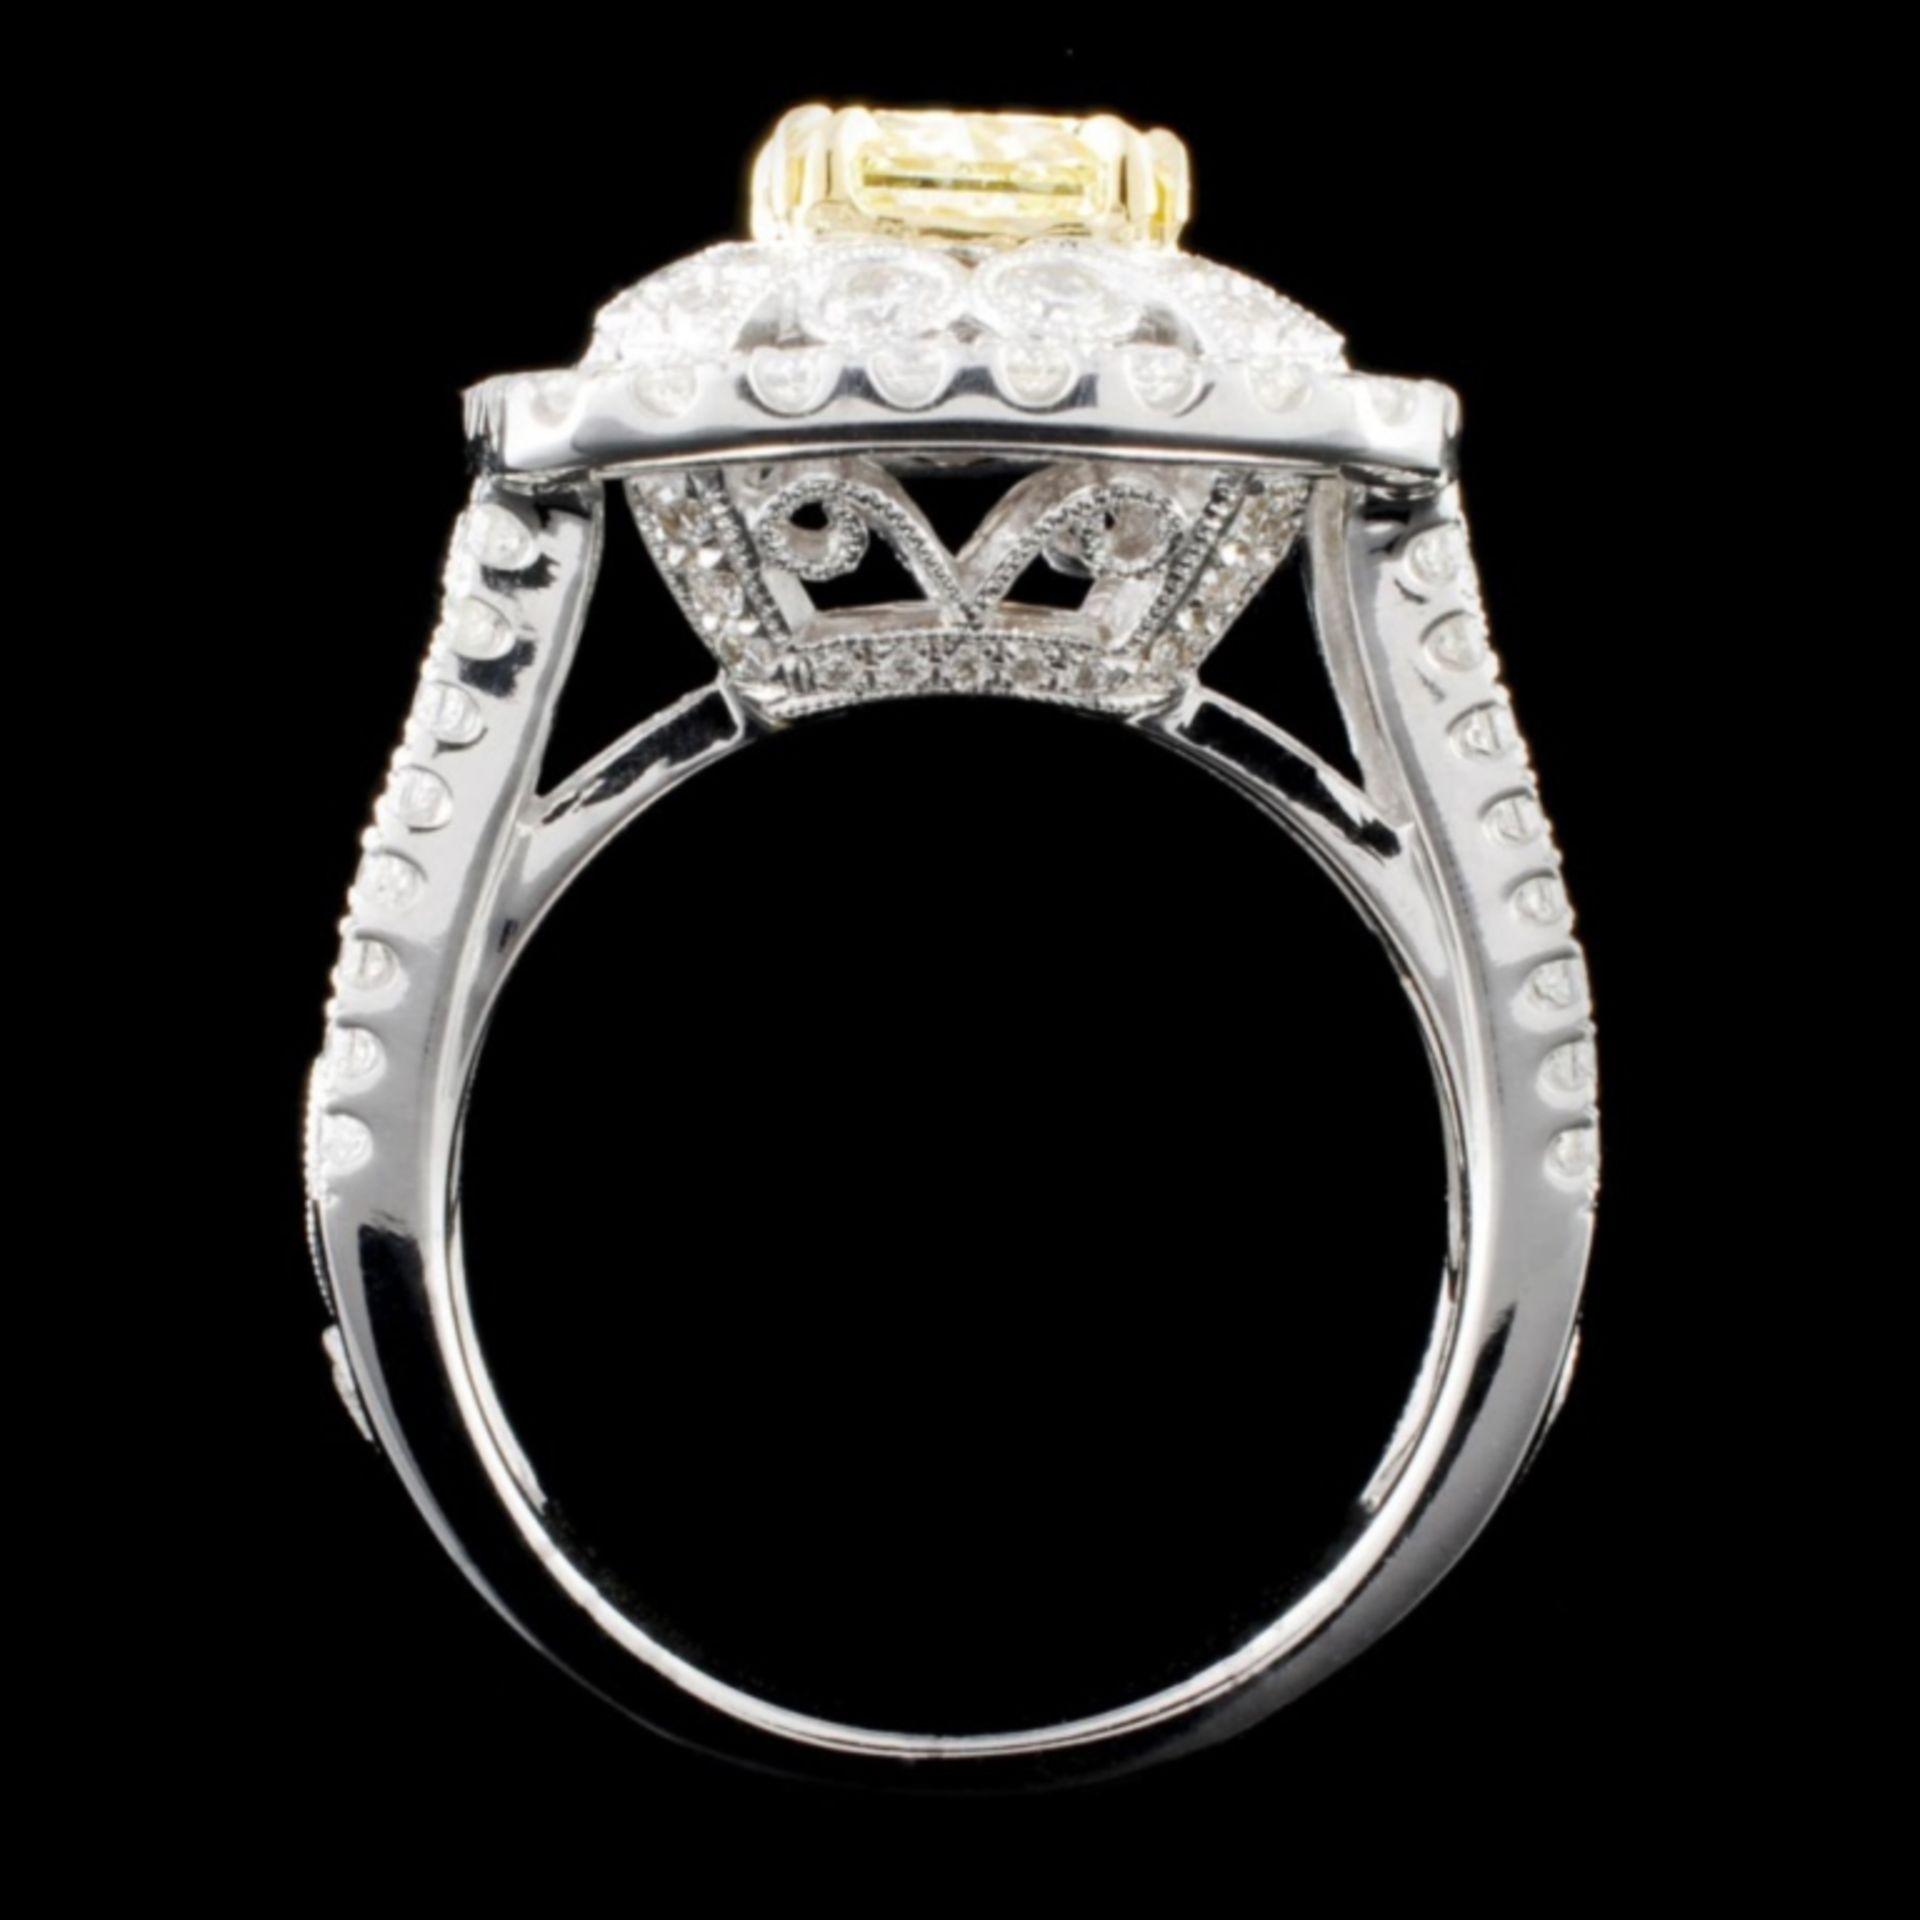 18K Gold 2.74ctw Fancy Diamond Ring - Image 3 of 4